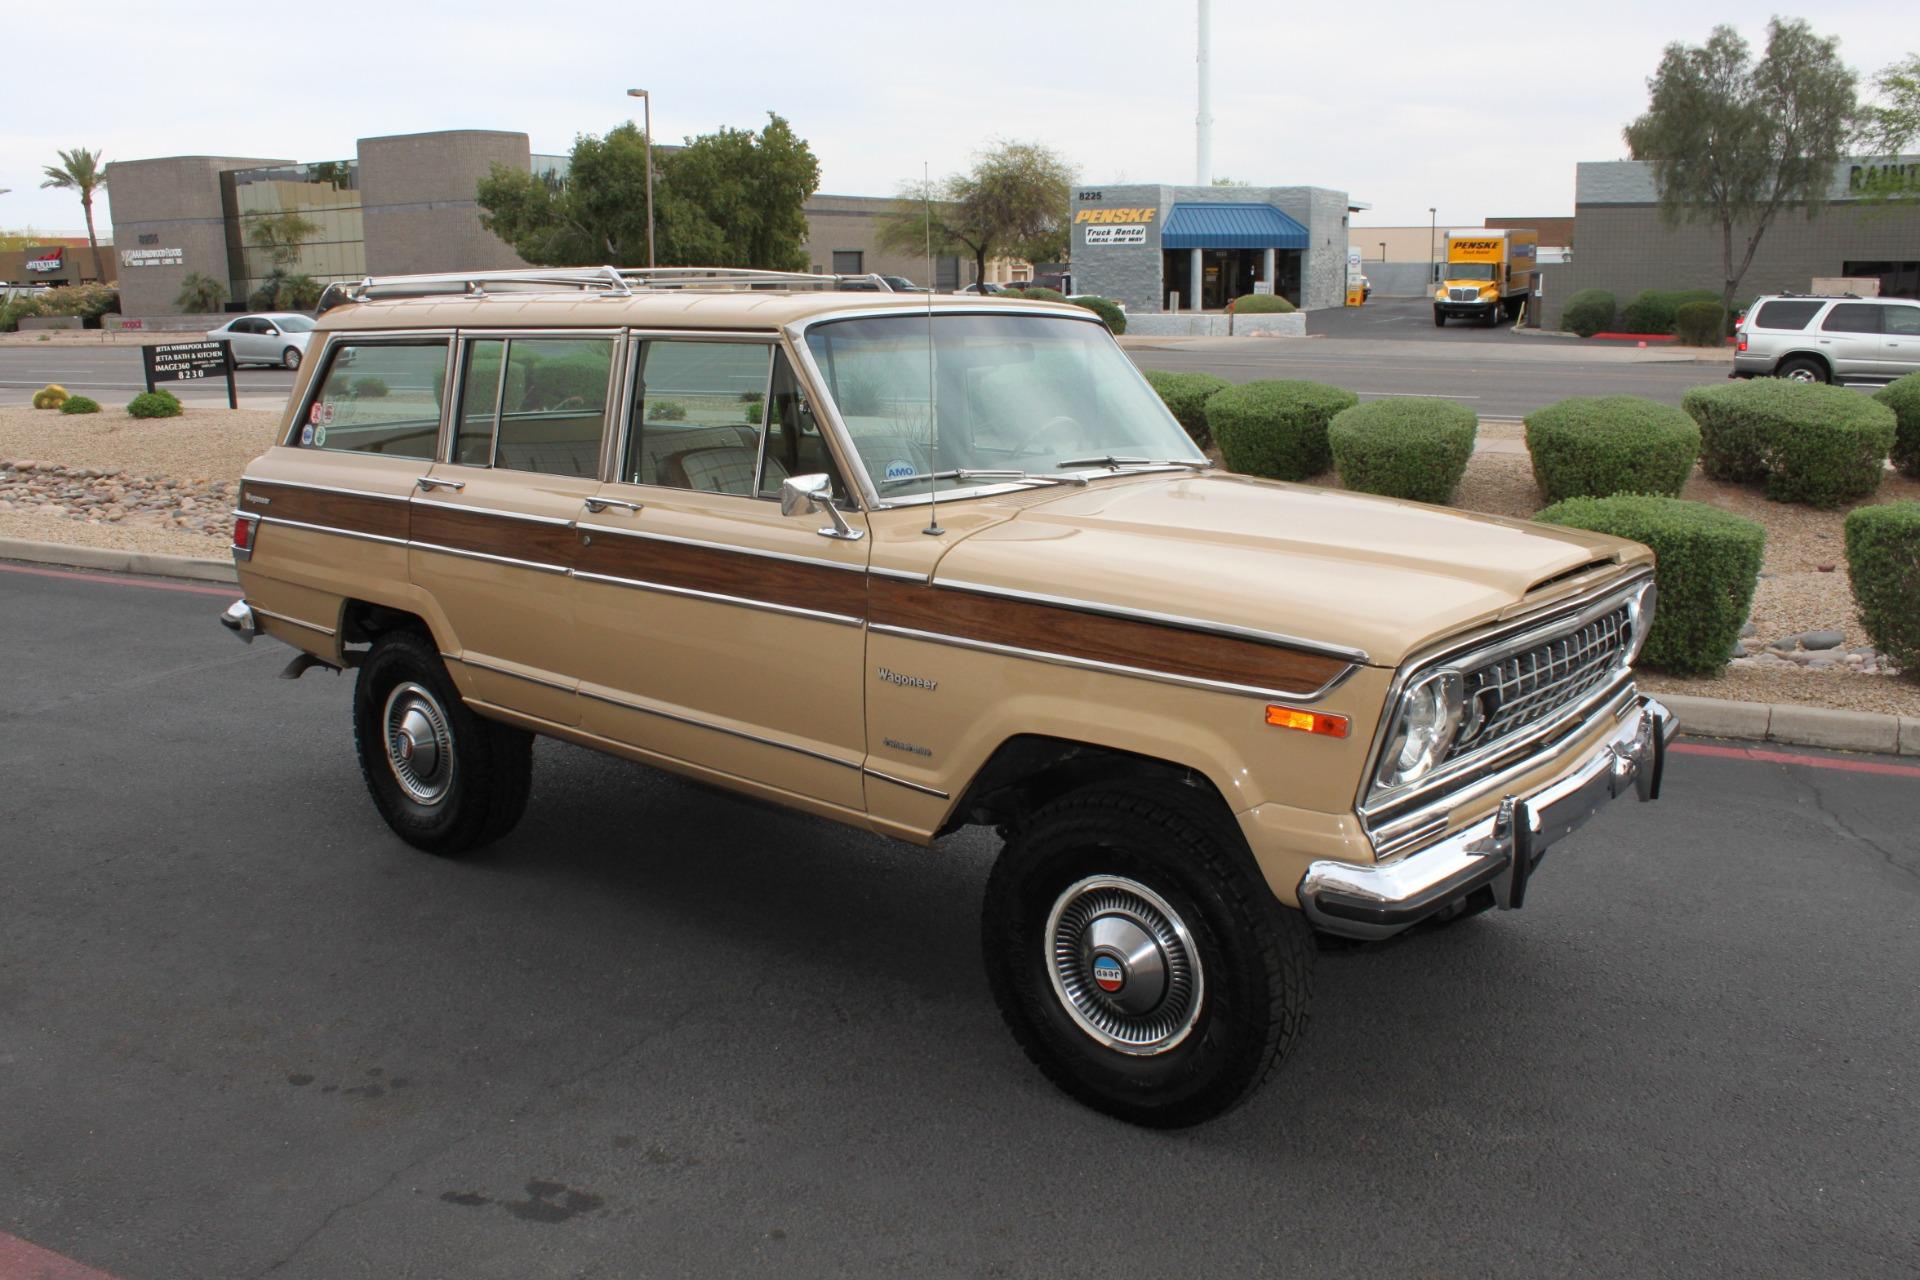 Used-1977-Jeep-Wagoneer-Brougham-Audi